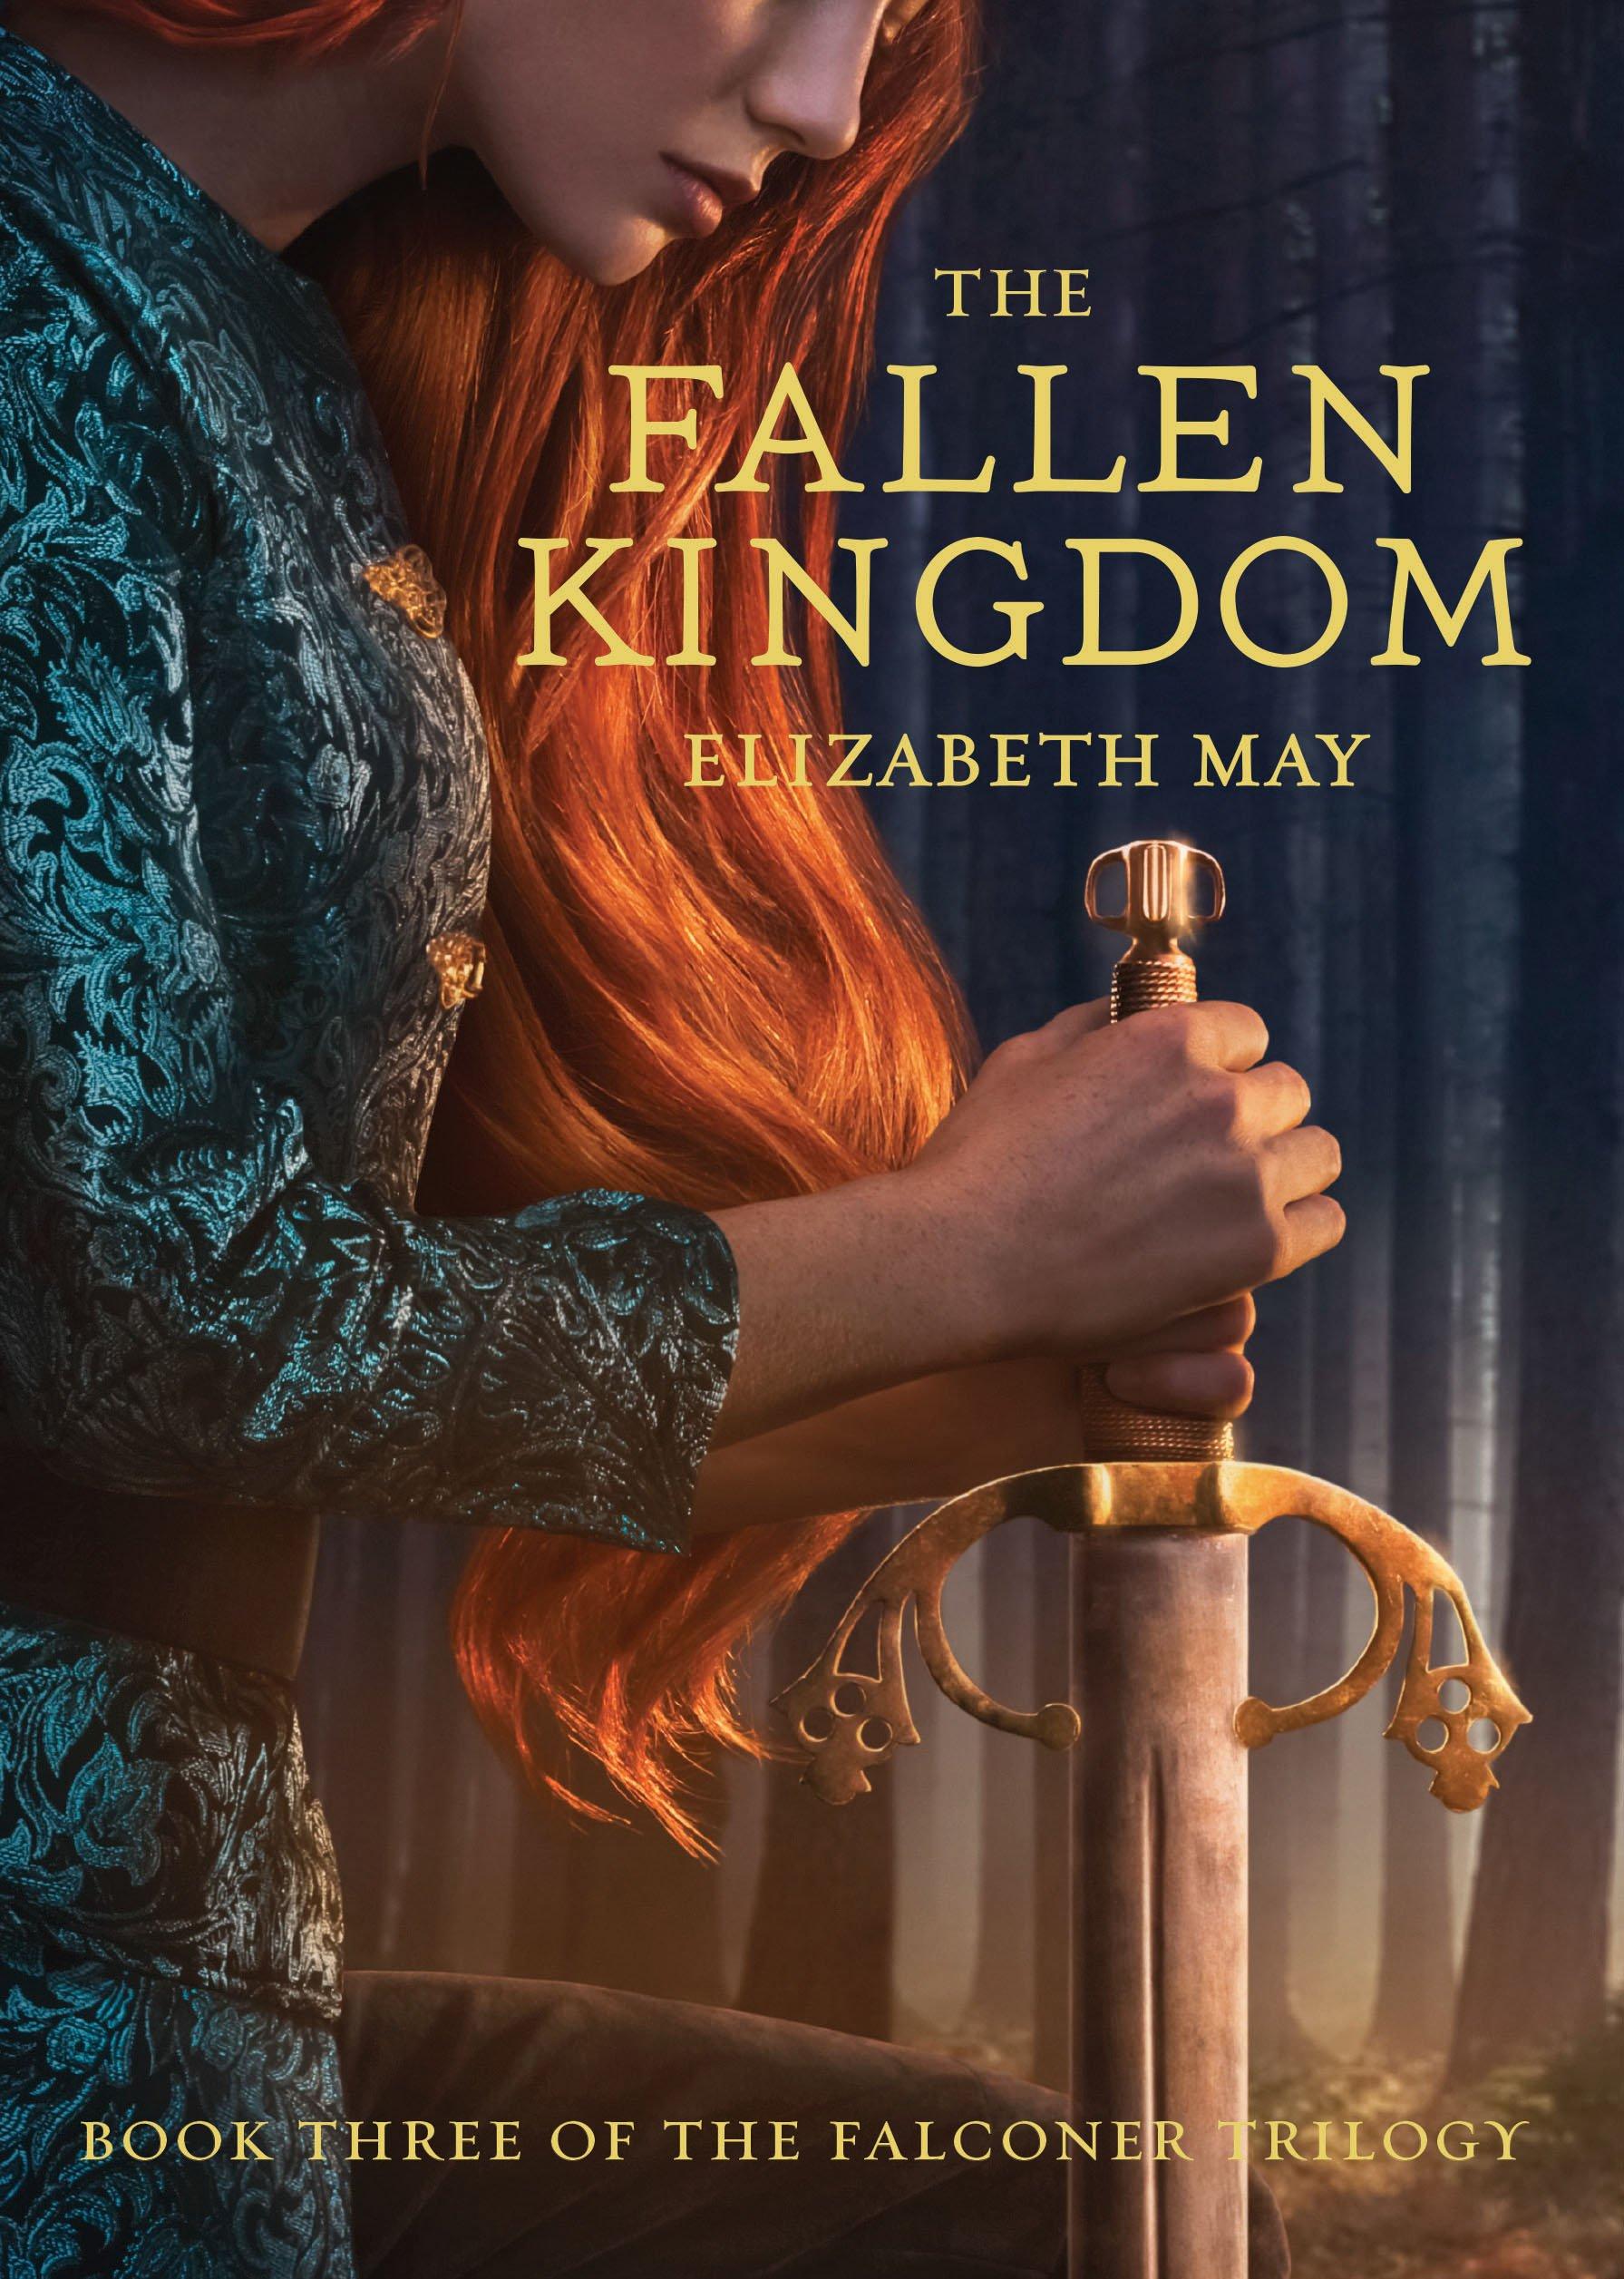 Falconer | The Fallen Kingdom